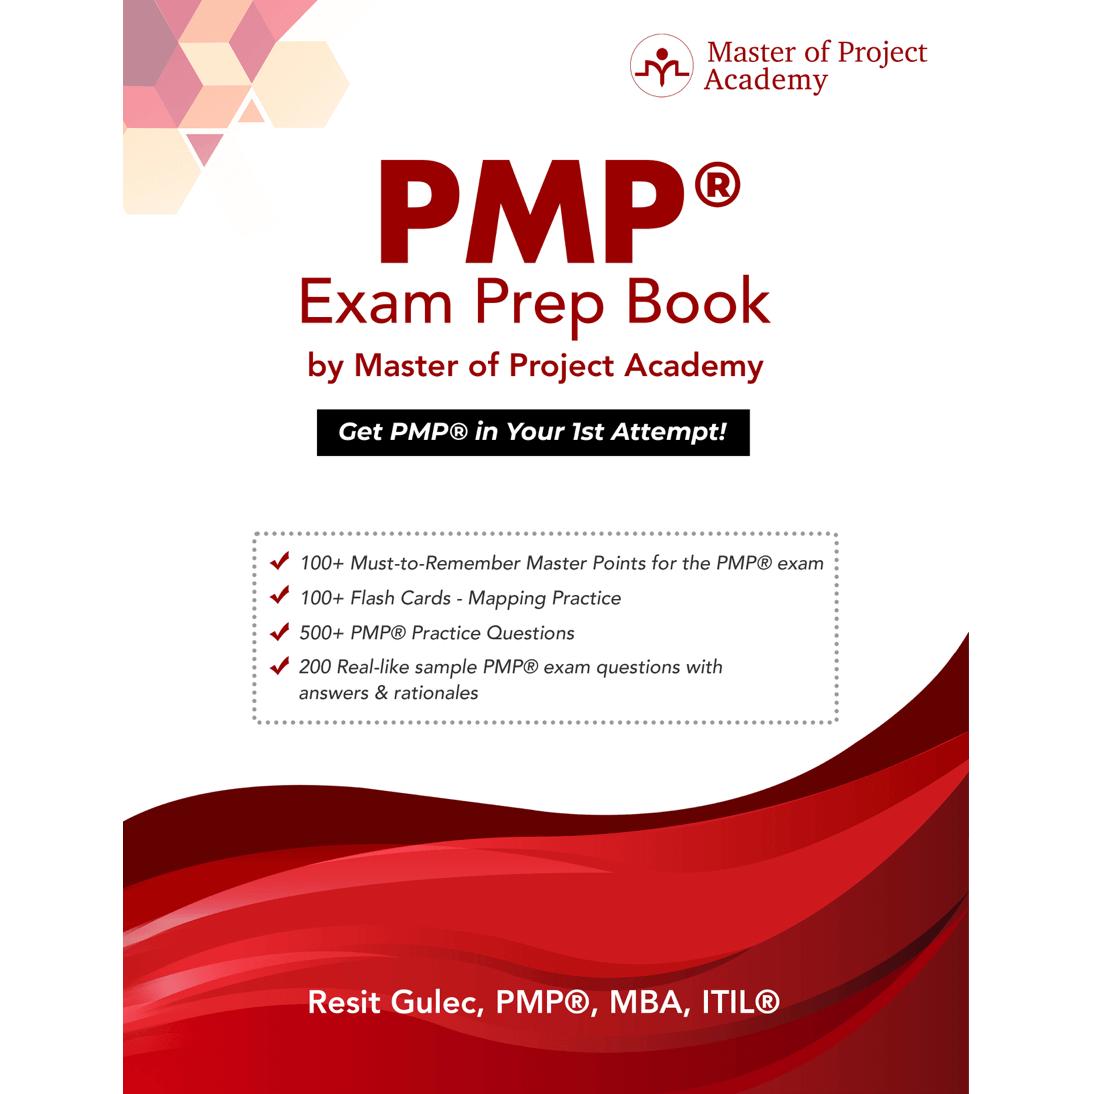 PMP-Prep-Book-Cover PMP Rita Mulcahy Book - 100% Review of How to Use Rita PMP Book